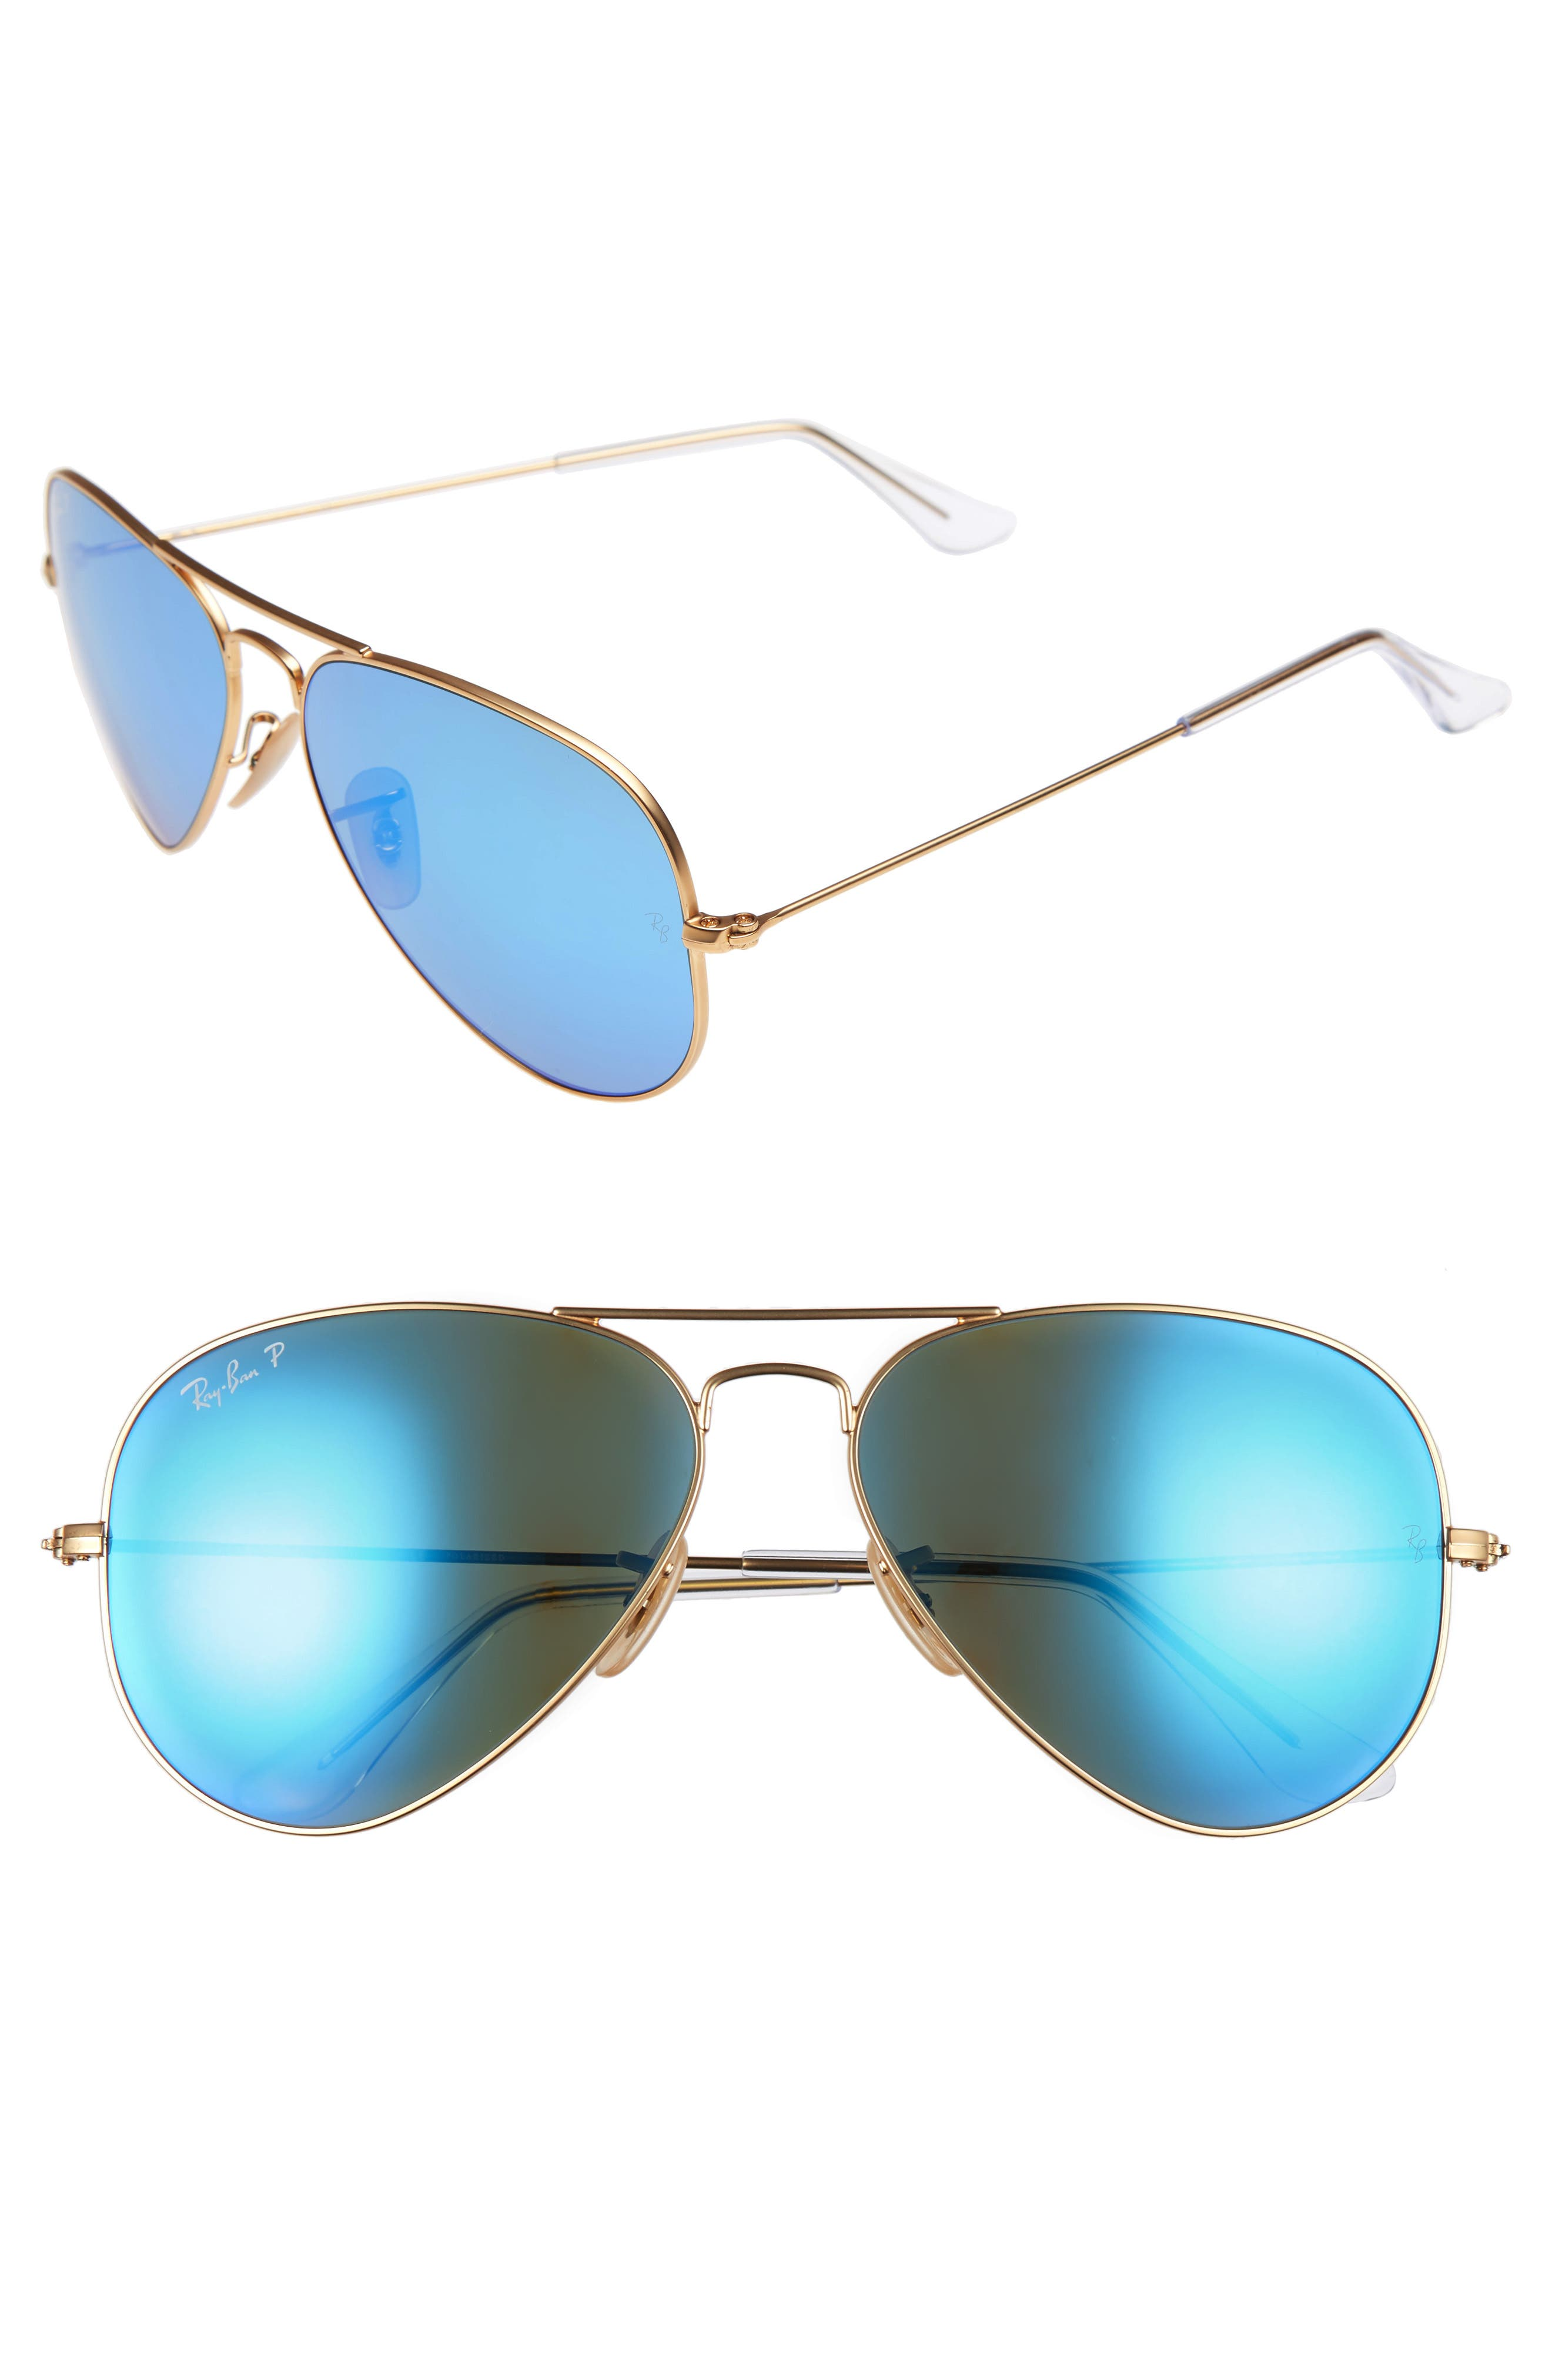 58mm Polarized Aviator Sunglasses,                         Main,                         color, MATTE GOLD/ BLUE MIRROR